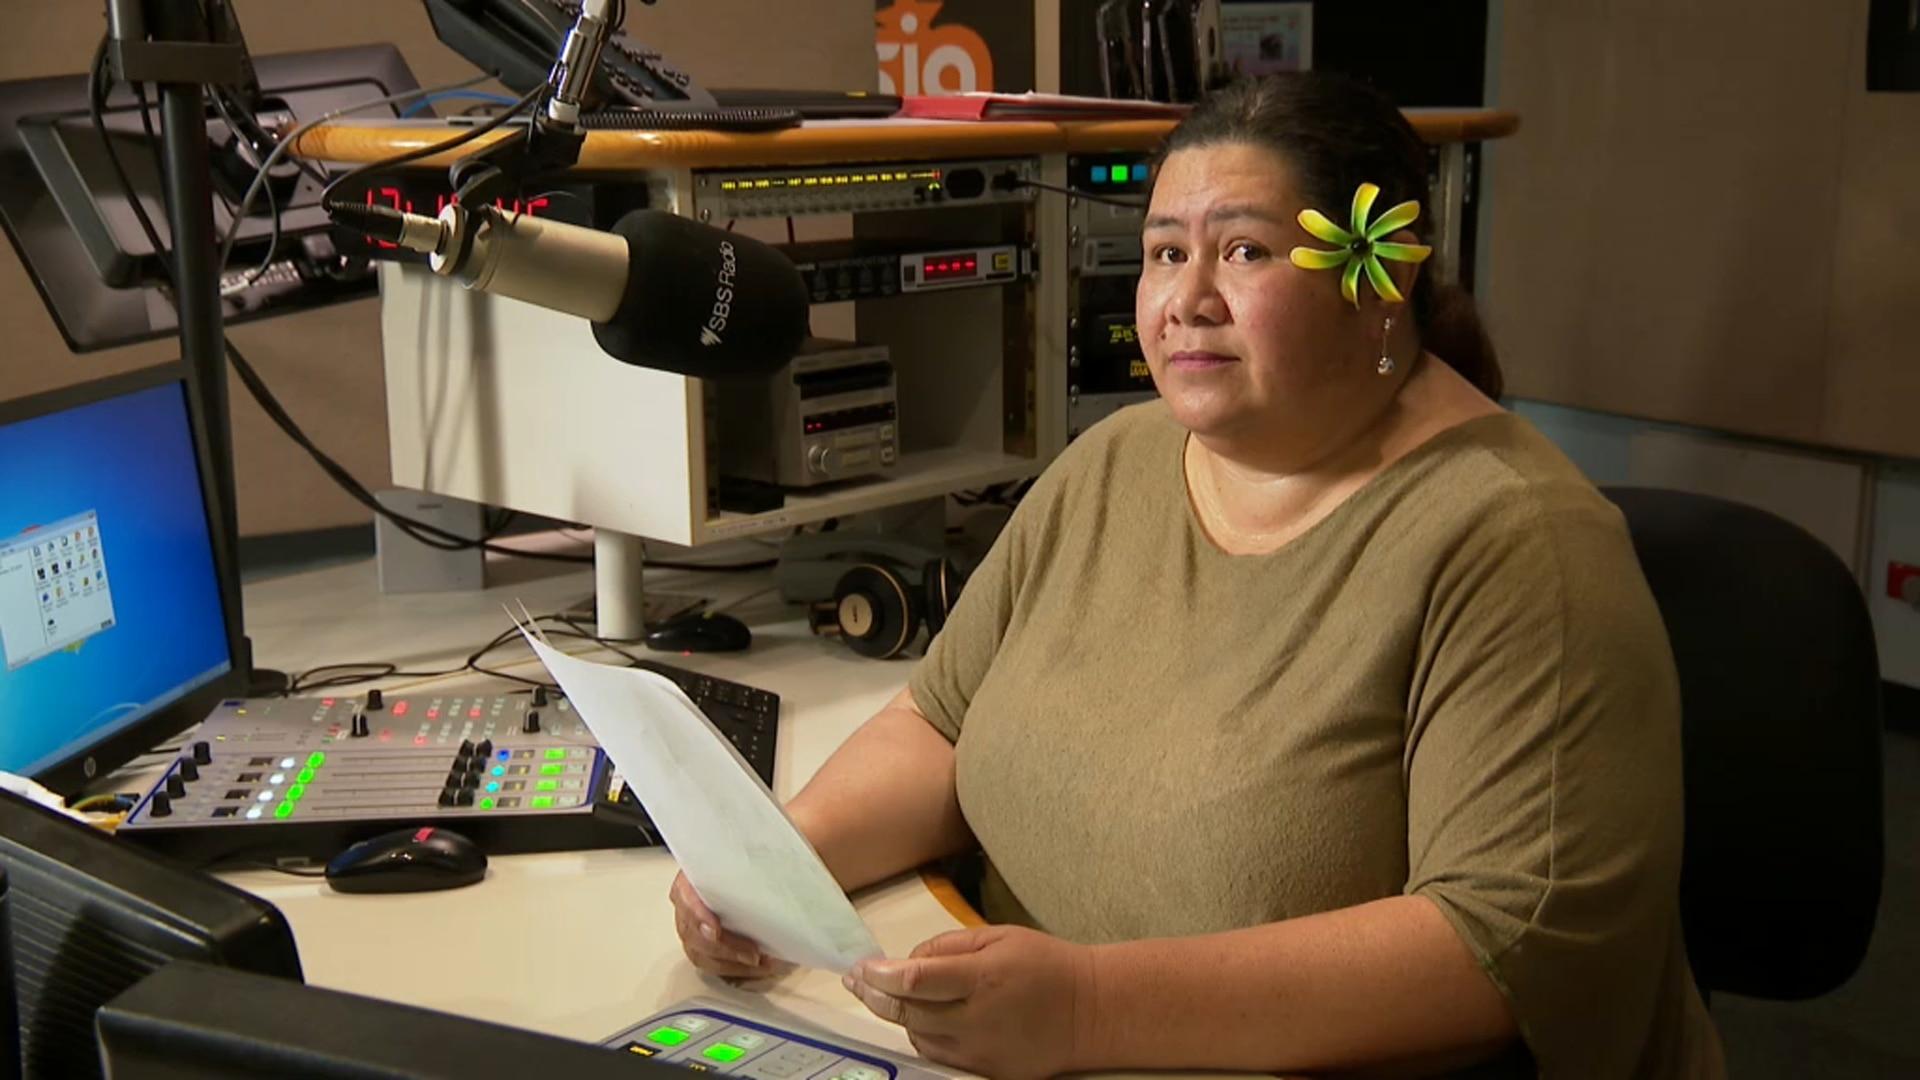 SBS Samoan's Miriama Pomare